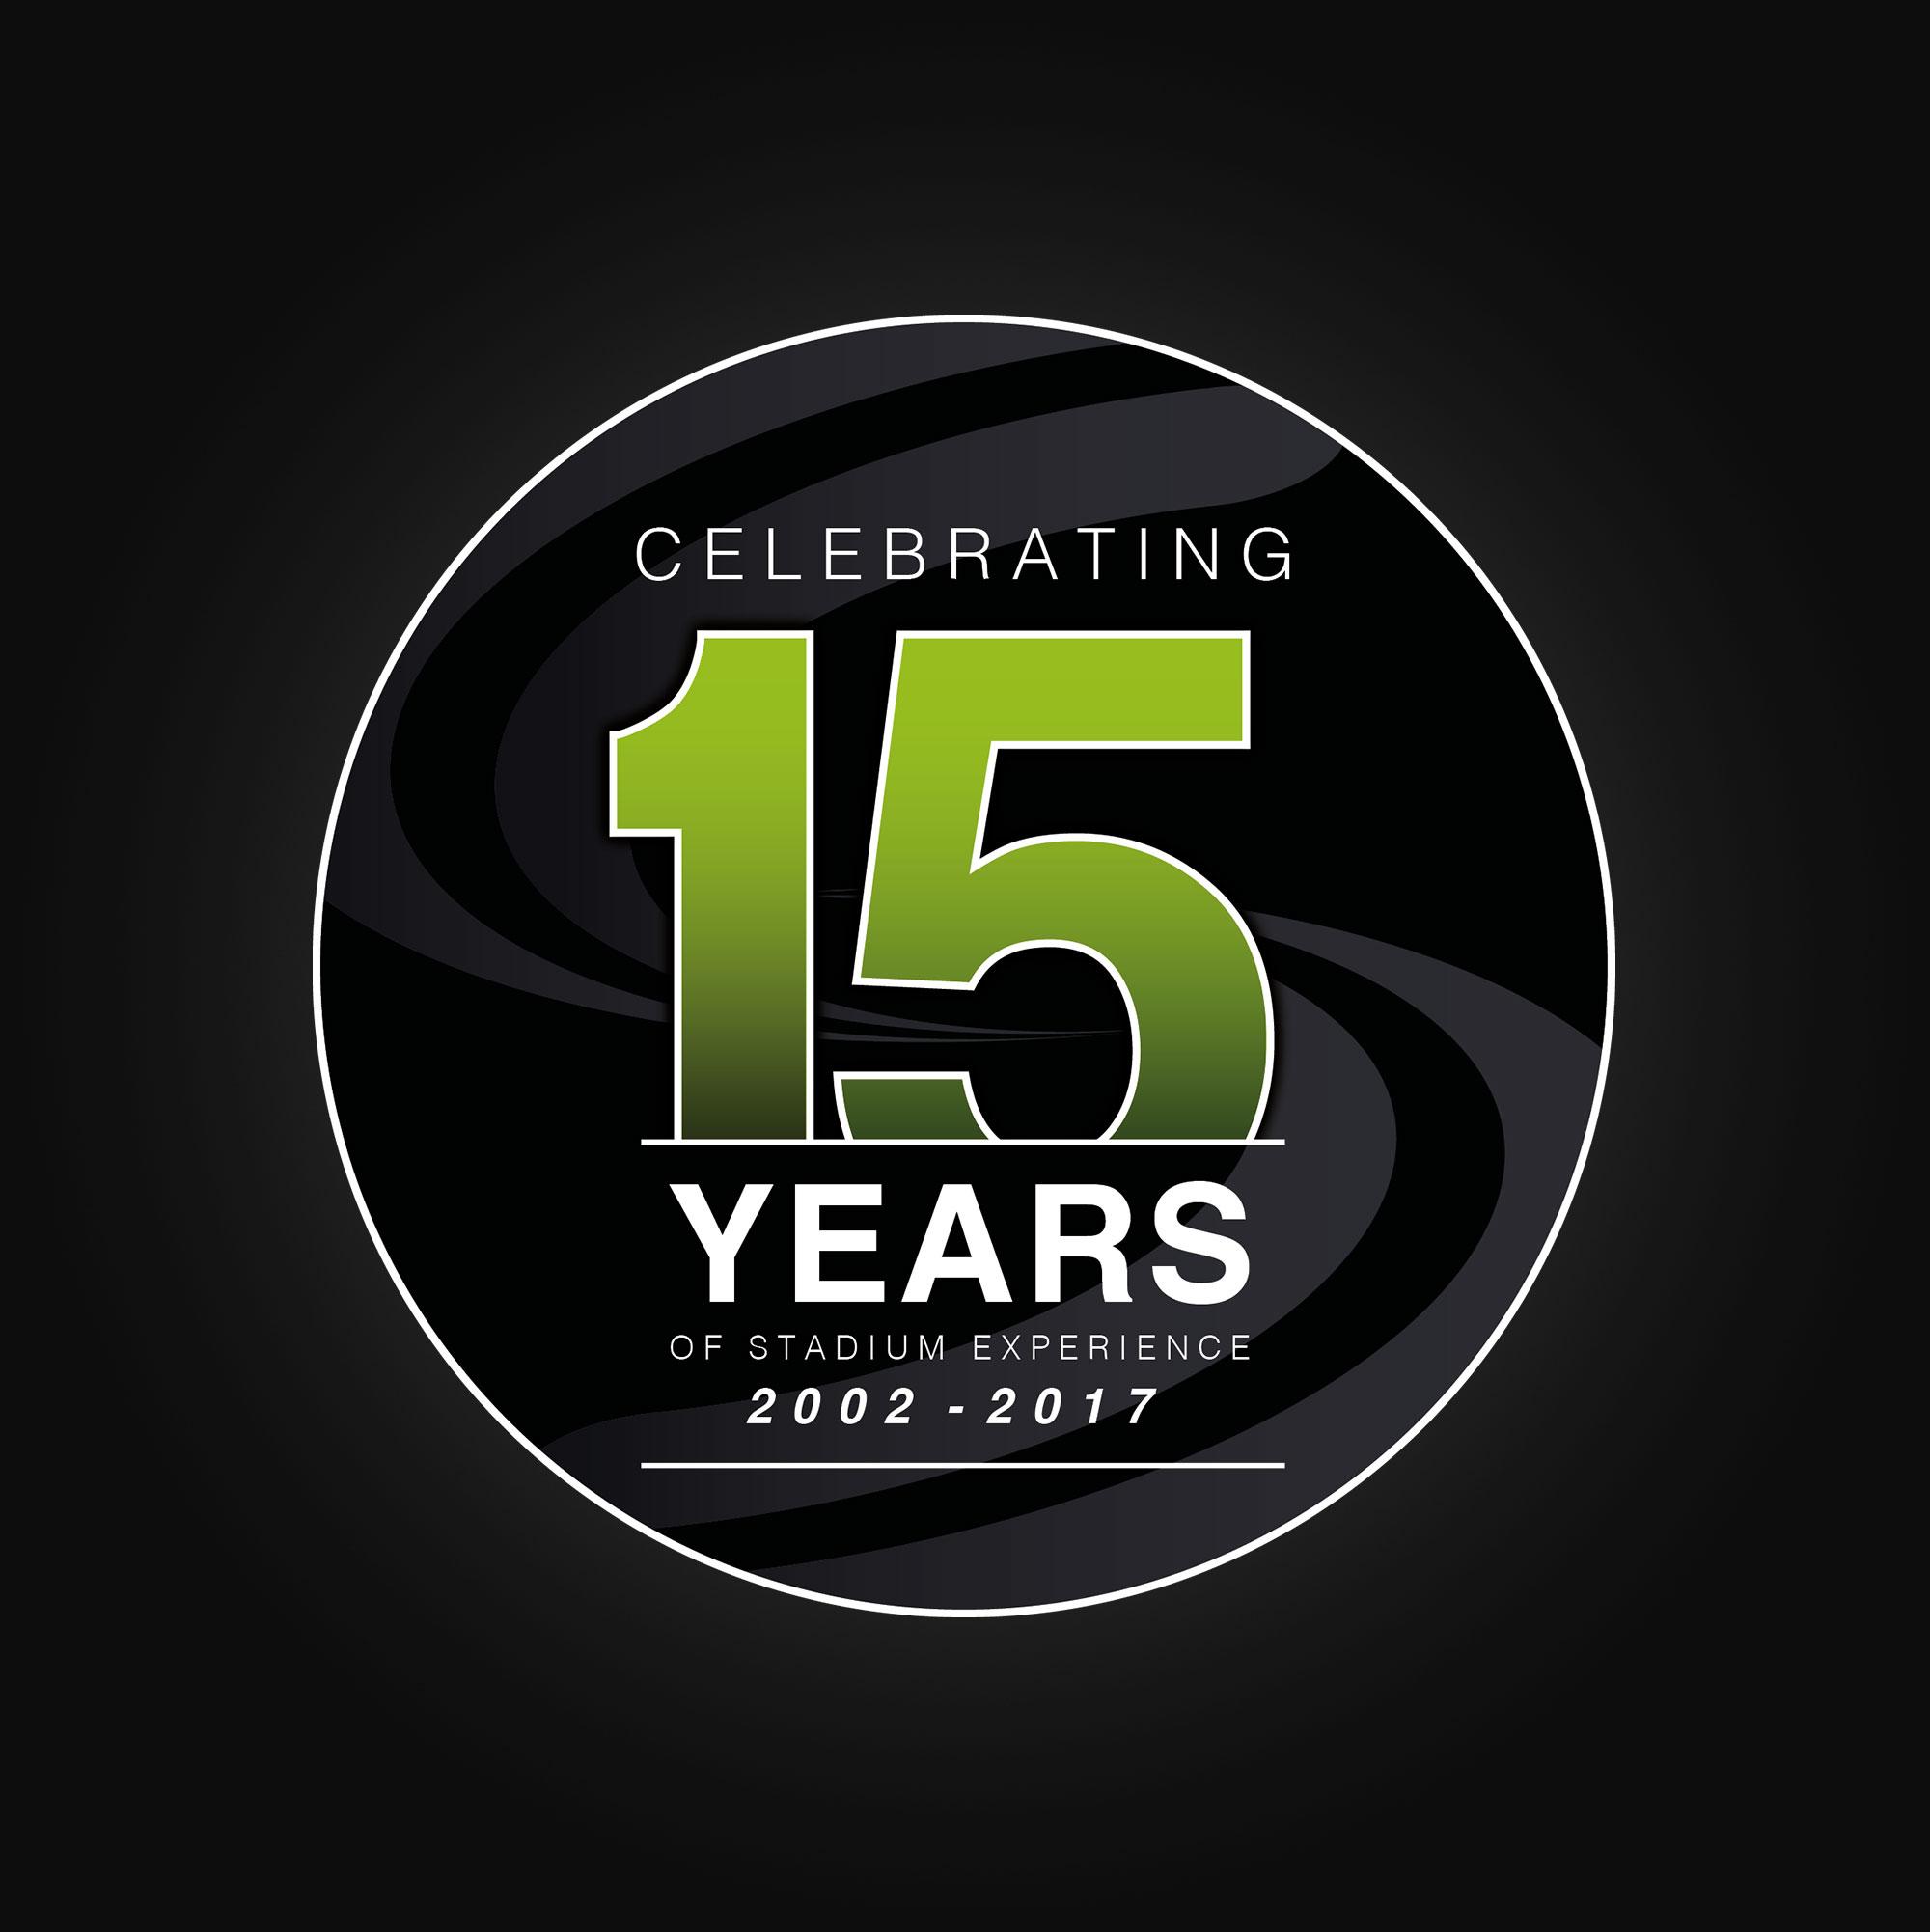 Stadium Experience Anniversary logo design